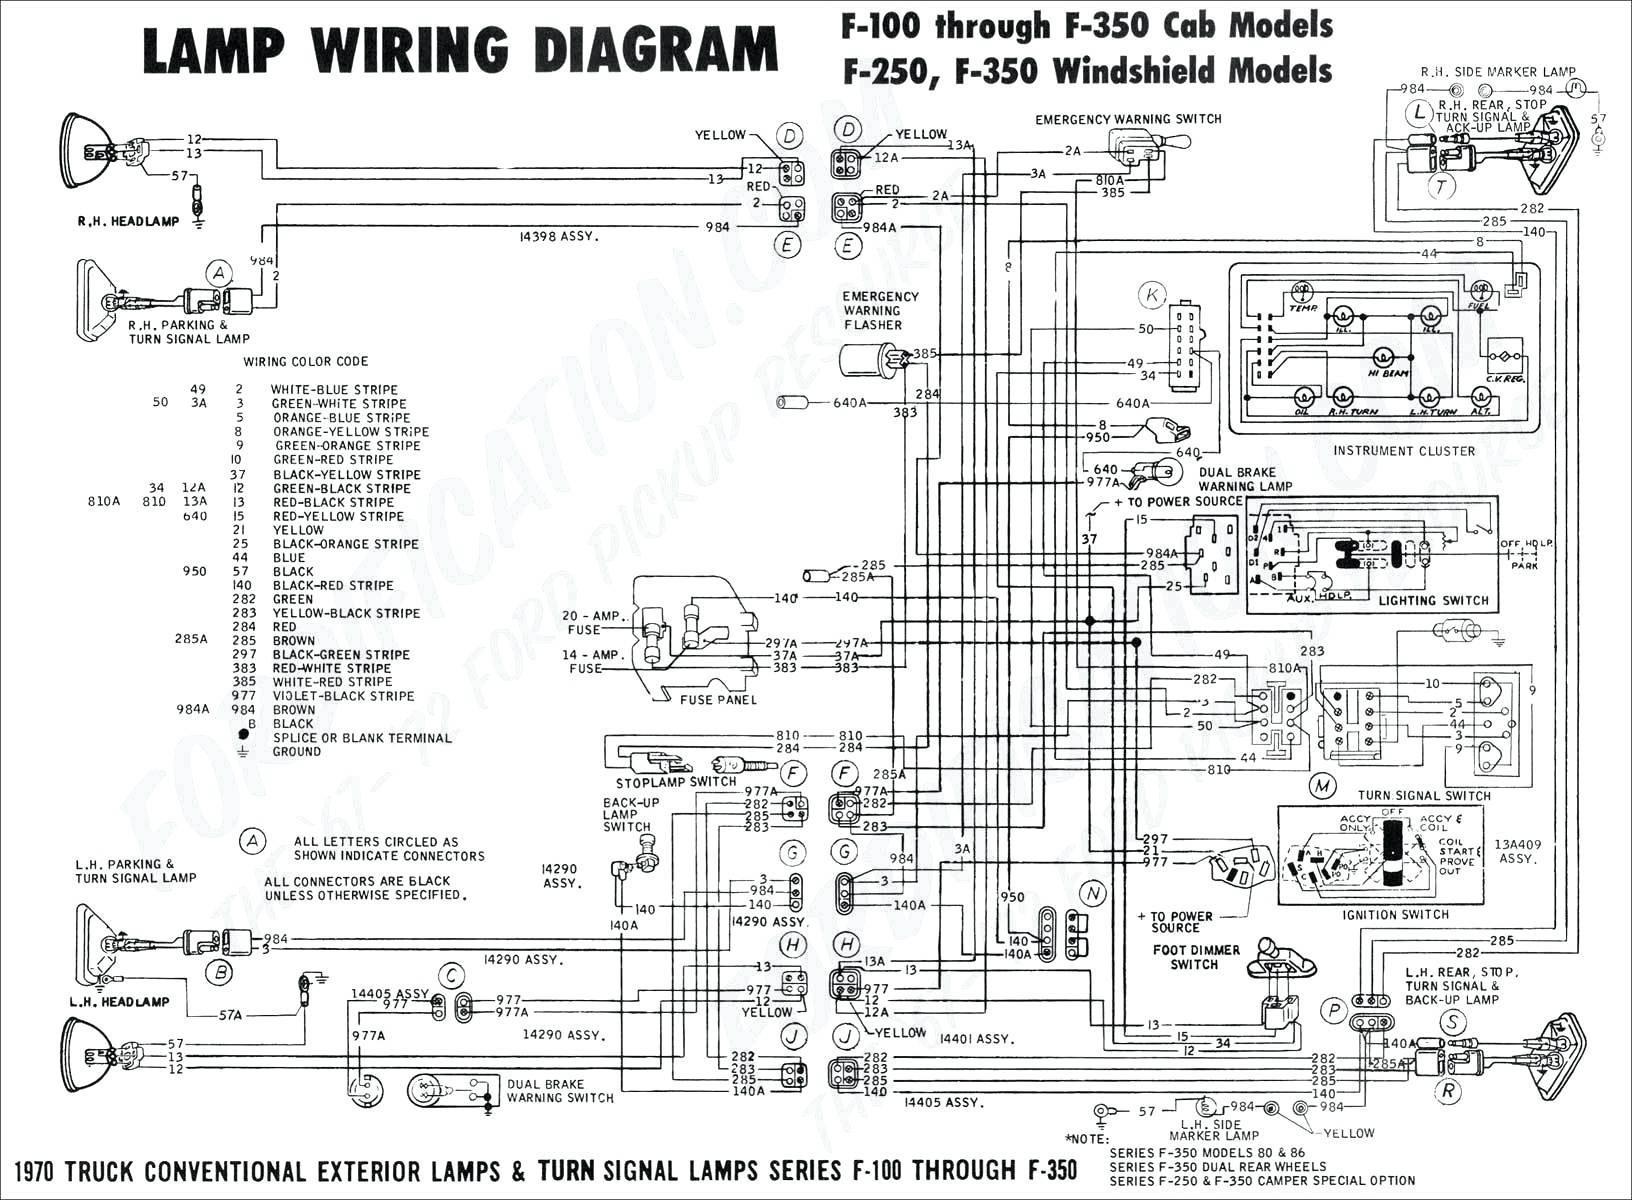 Wiring Diagram Replace Generator With Alternator 6 V26No1 Fig4 - Wiring Diagram Replace Generator With Alternator